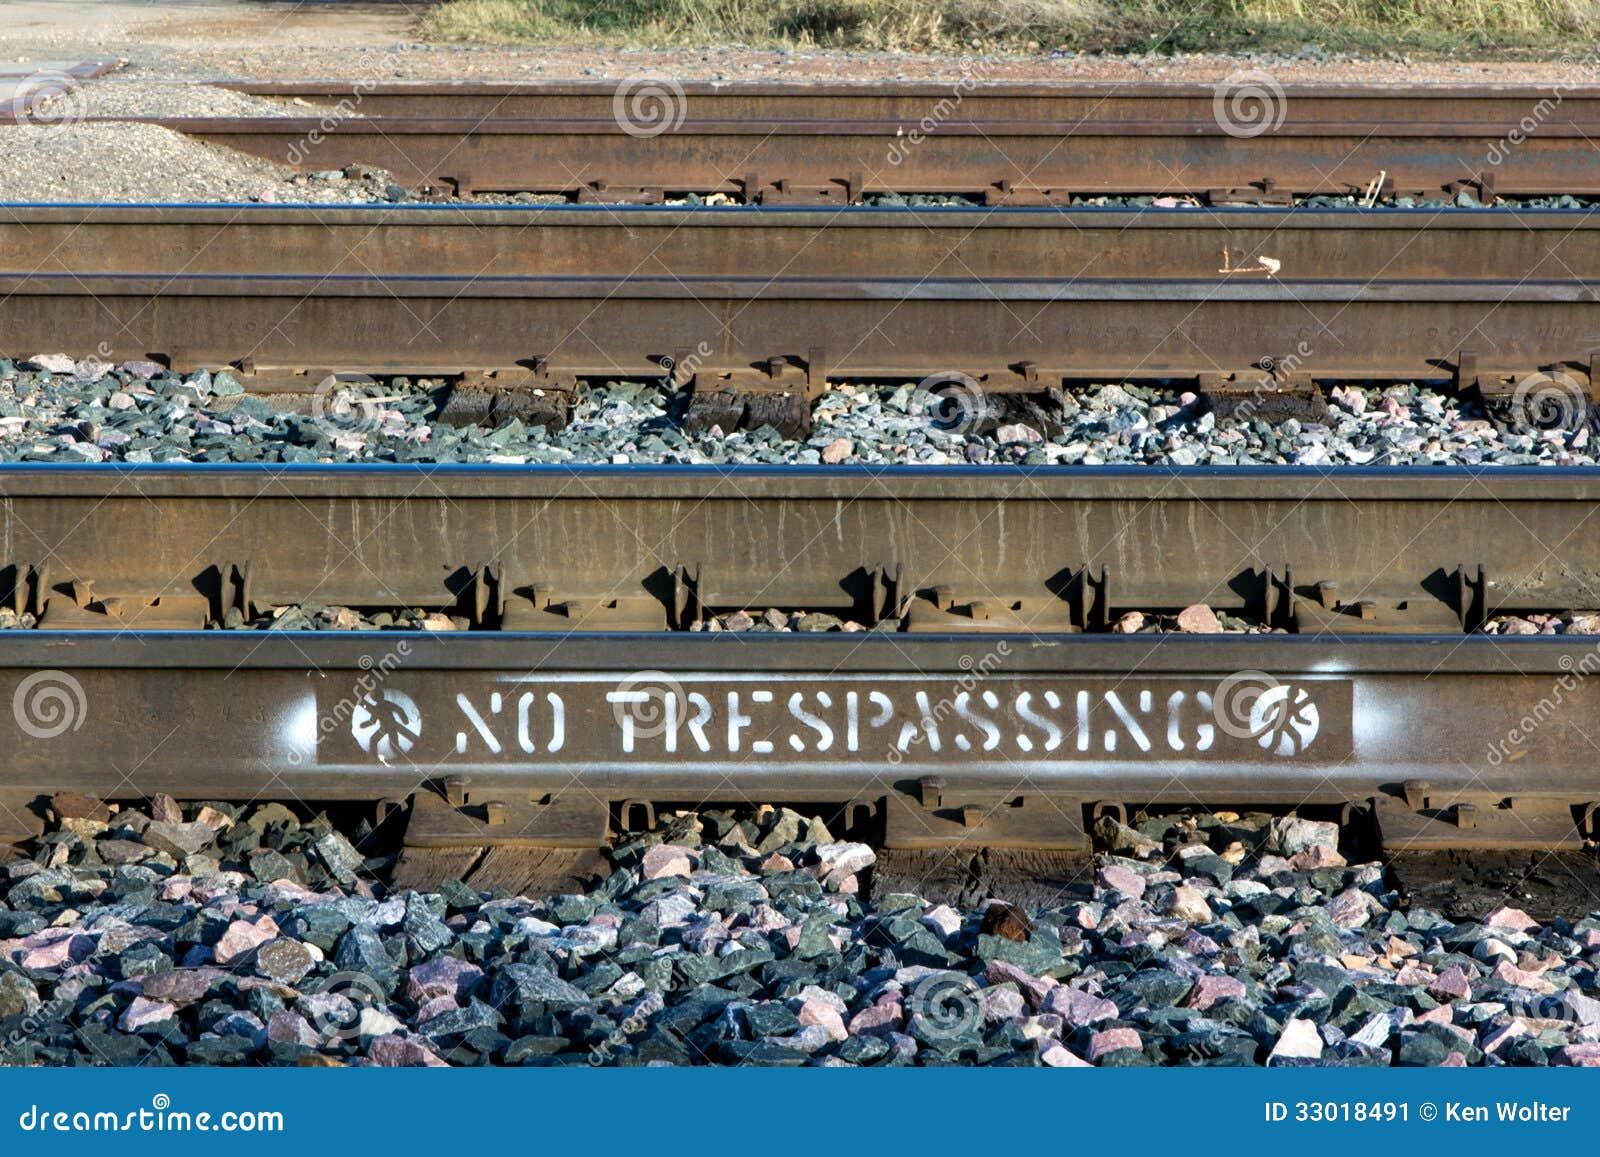 Railroad Tracks Marked Warn of No Trespassing.